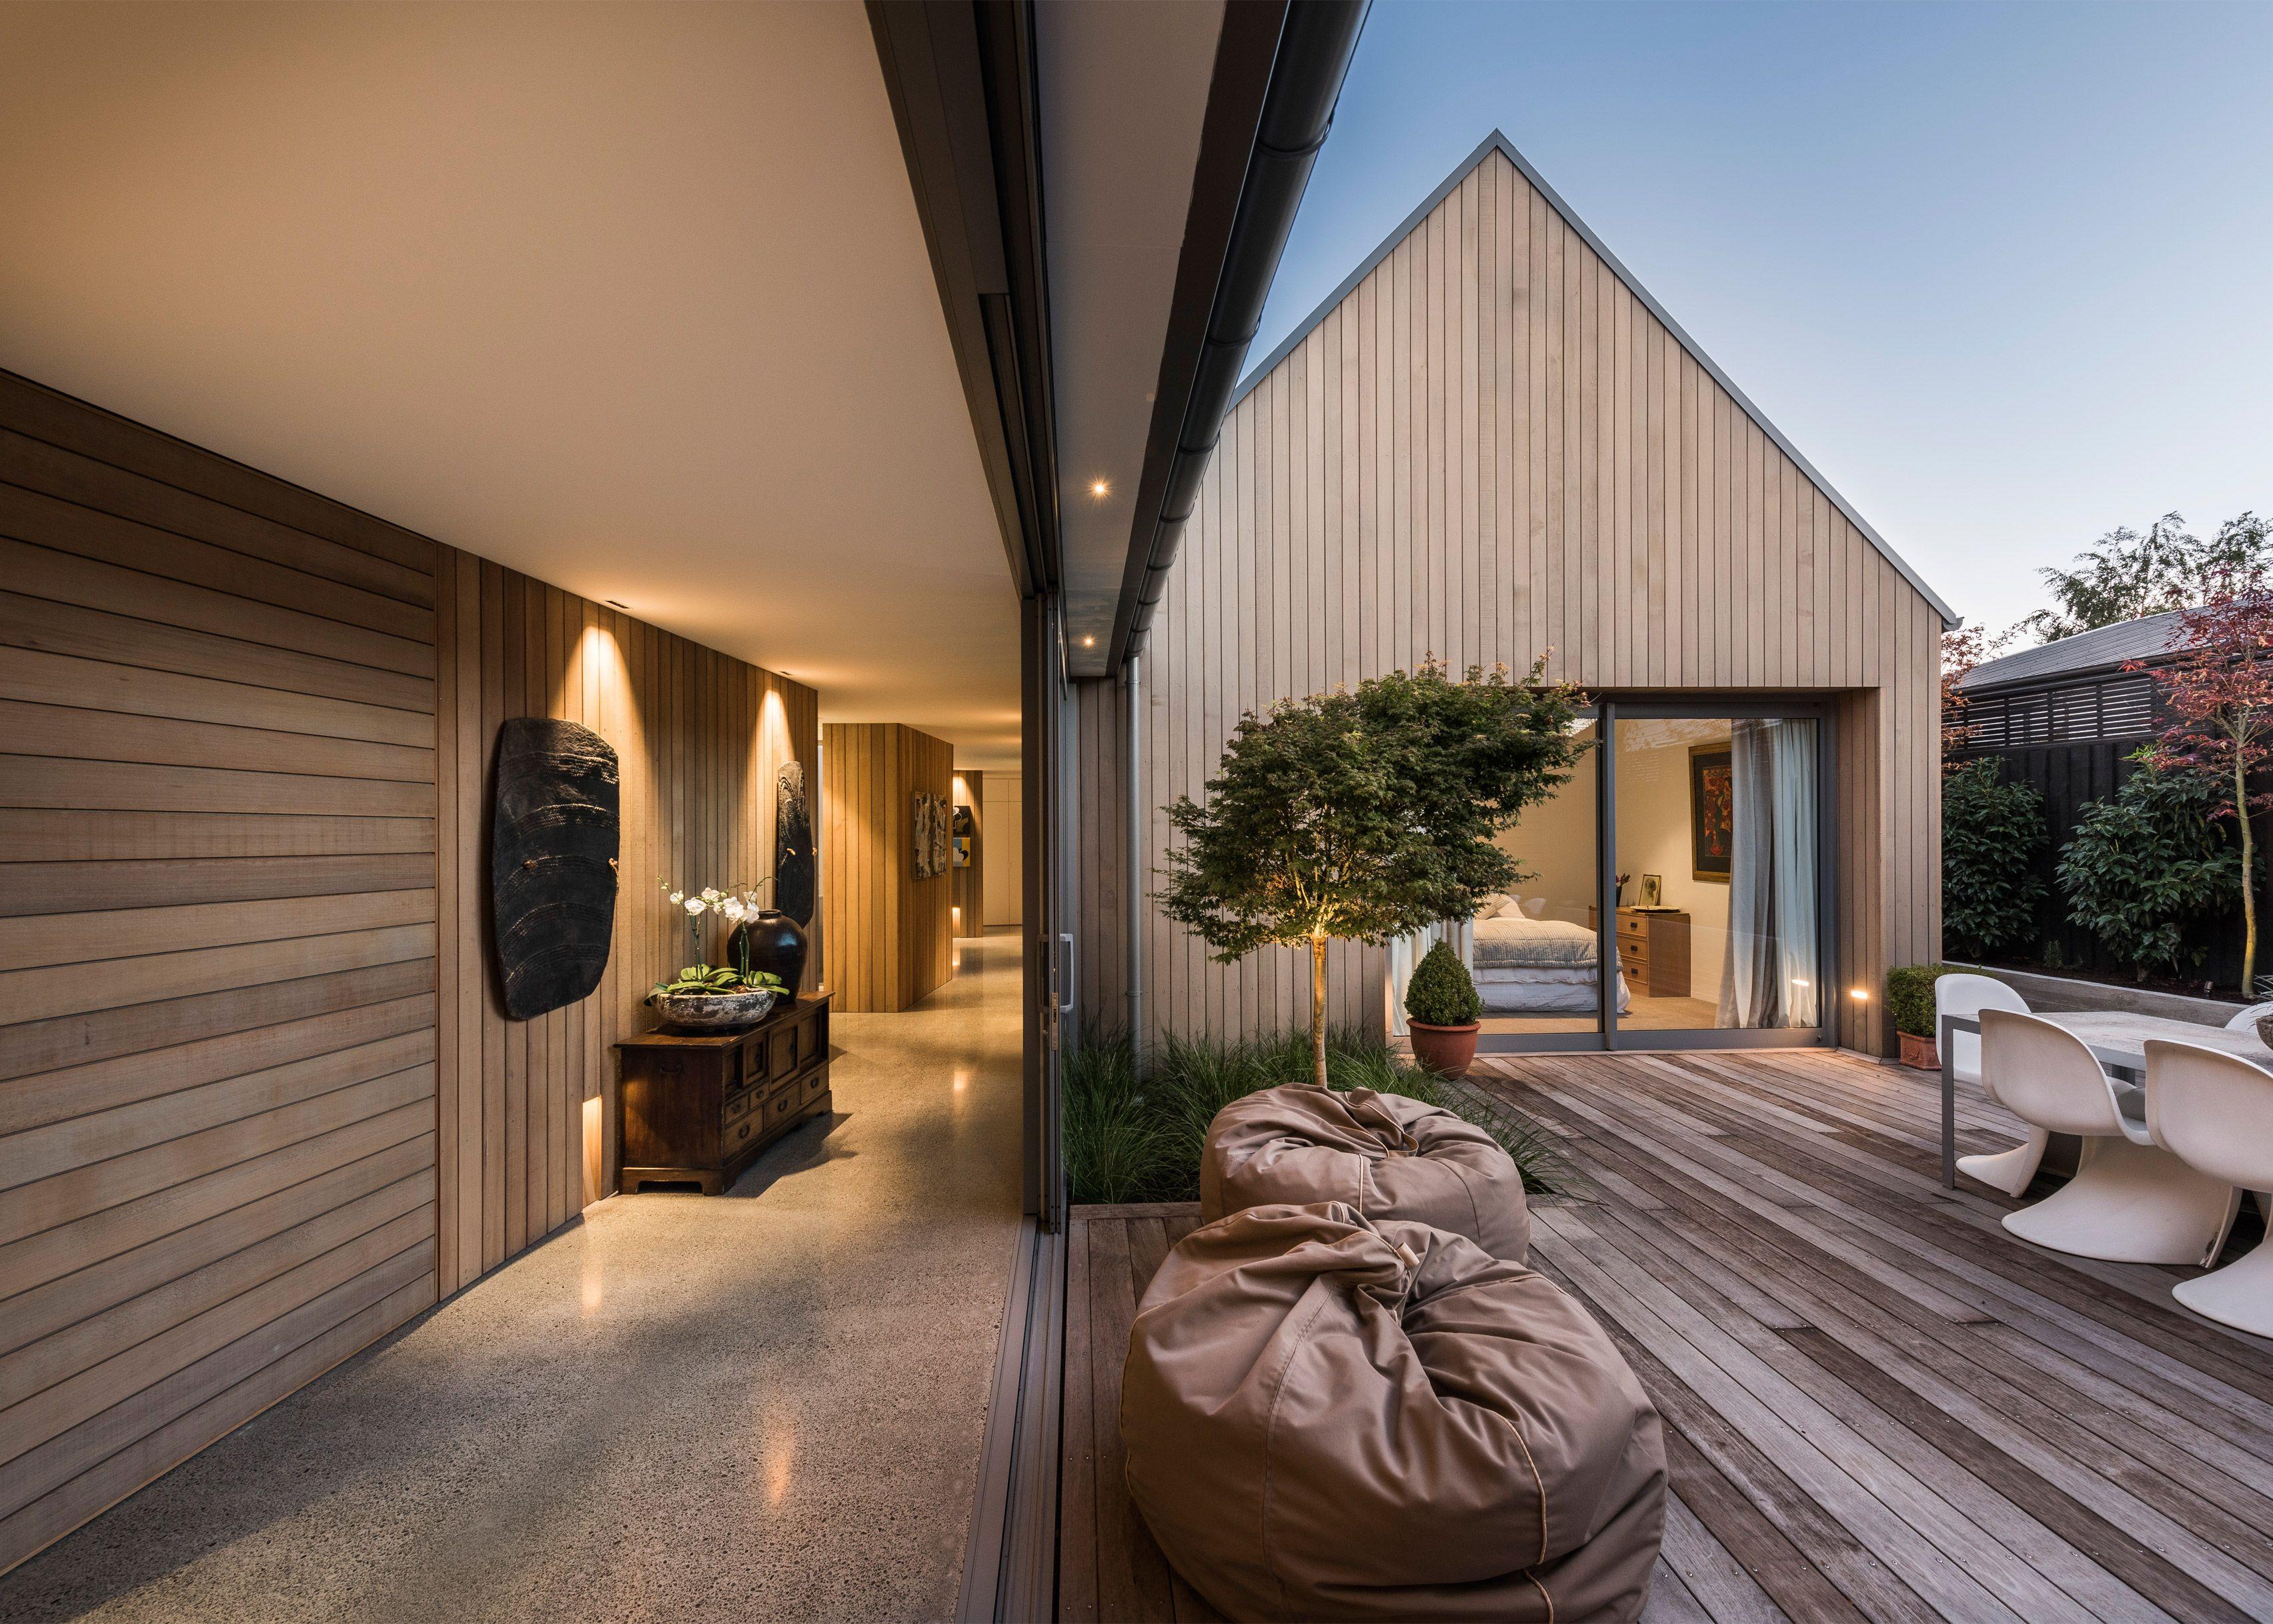 Courtyard Cedar Homes Design Home - Modern Home Design Ideas